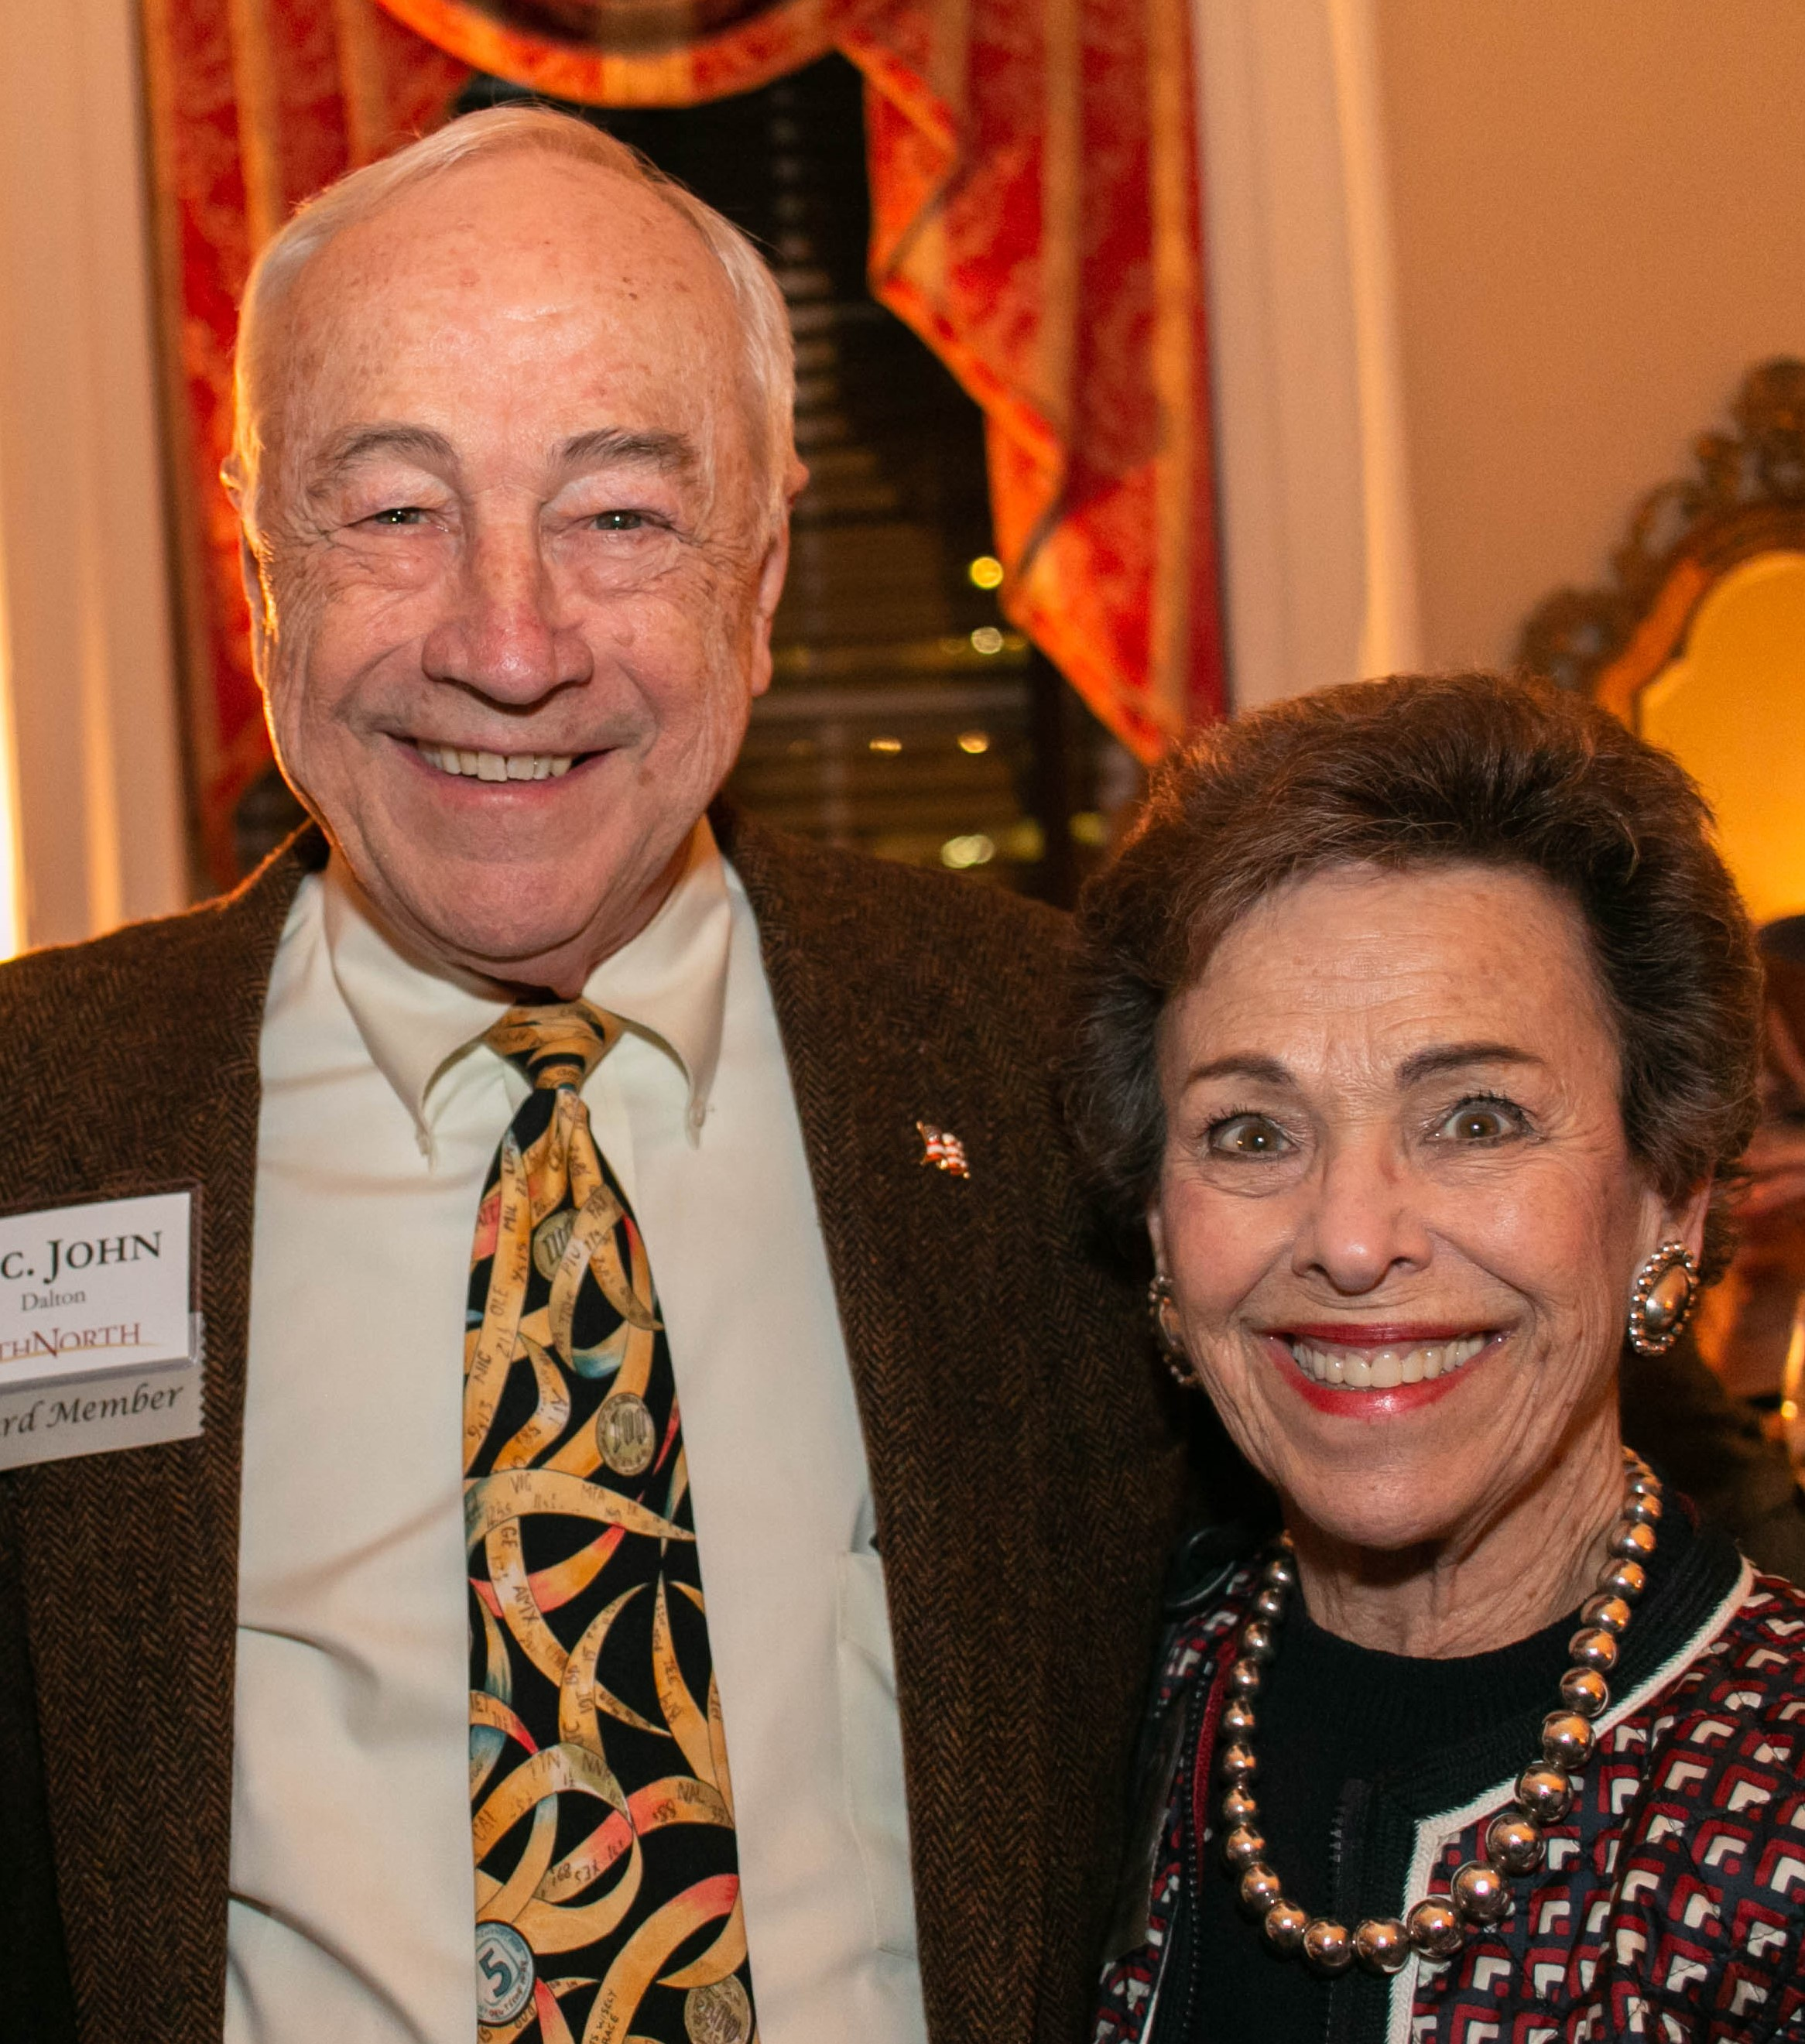 Secretary John & Margaret Dalton at the 2019 PathNorth Annual Gathering